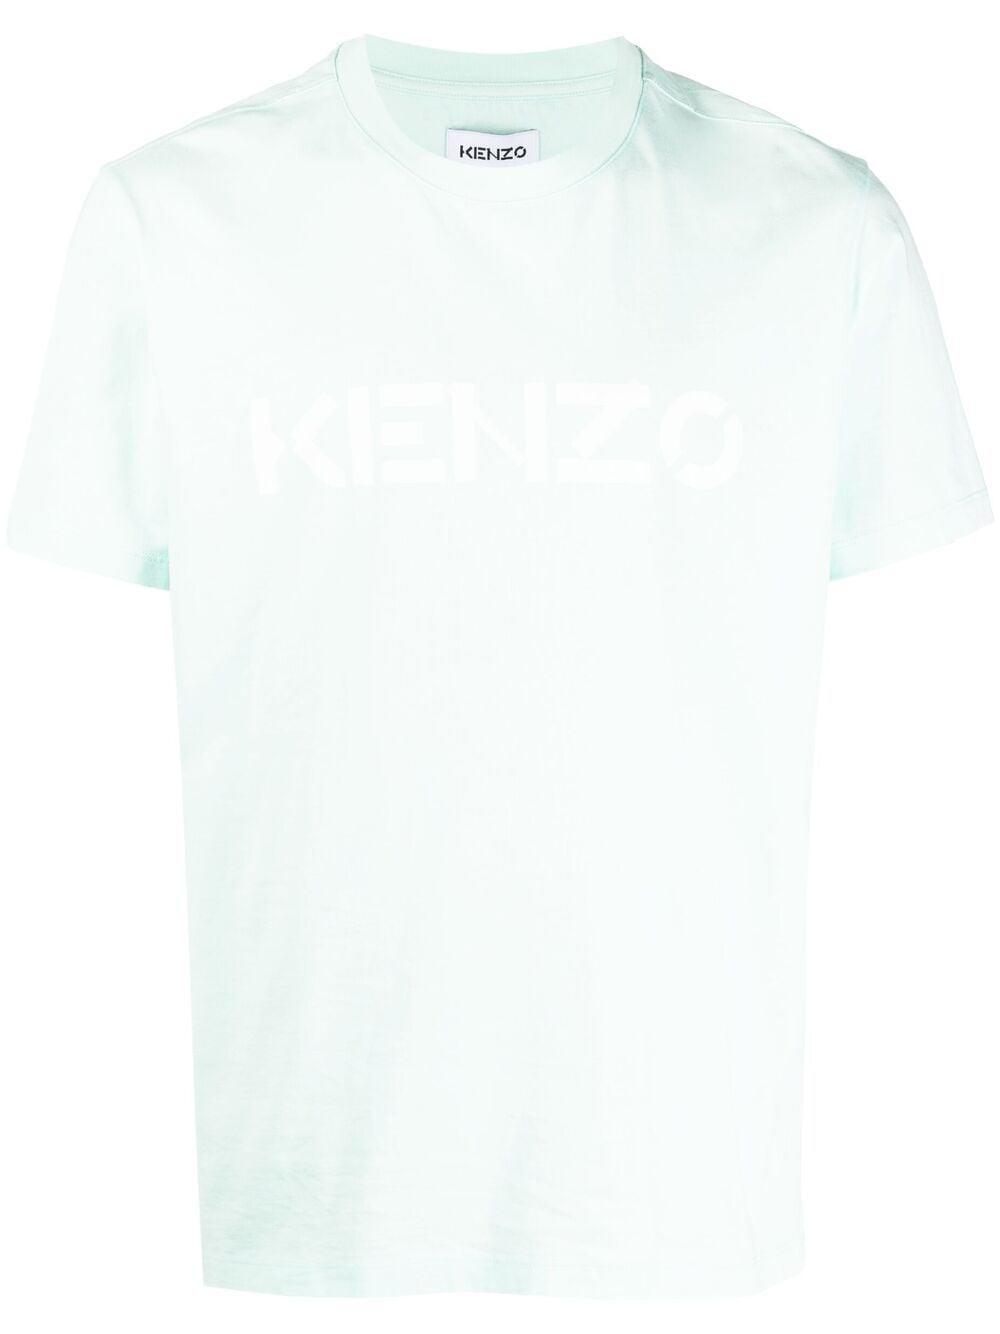 LOGO PRINT T-SHIRT KENZO | T-shirts | FA65TS0004SJ58